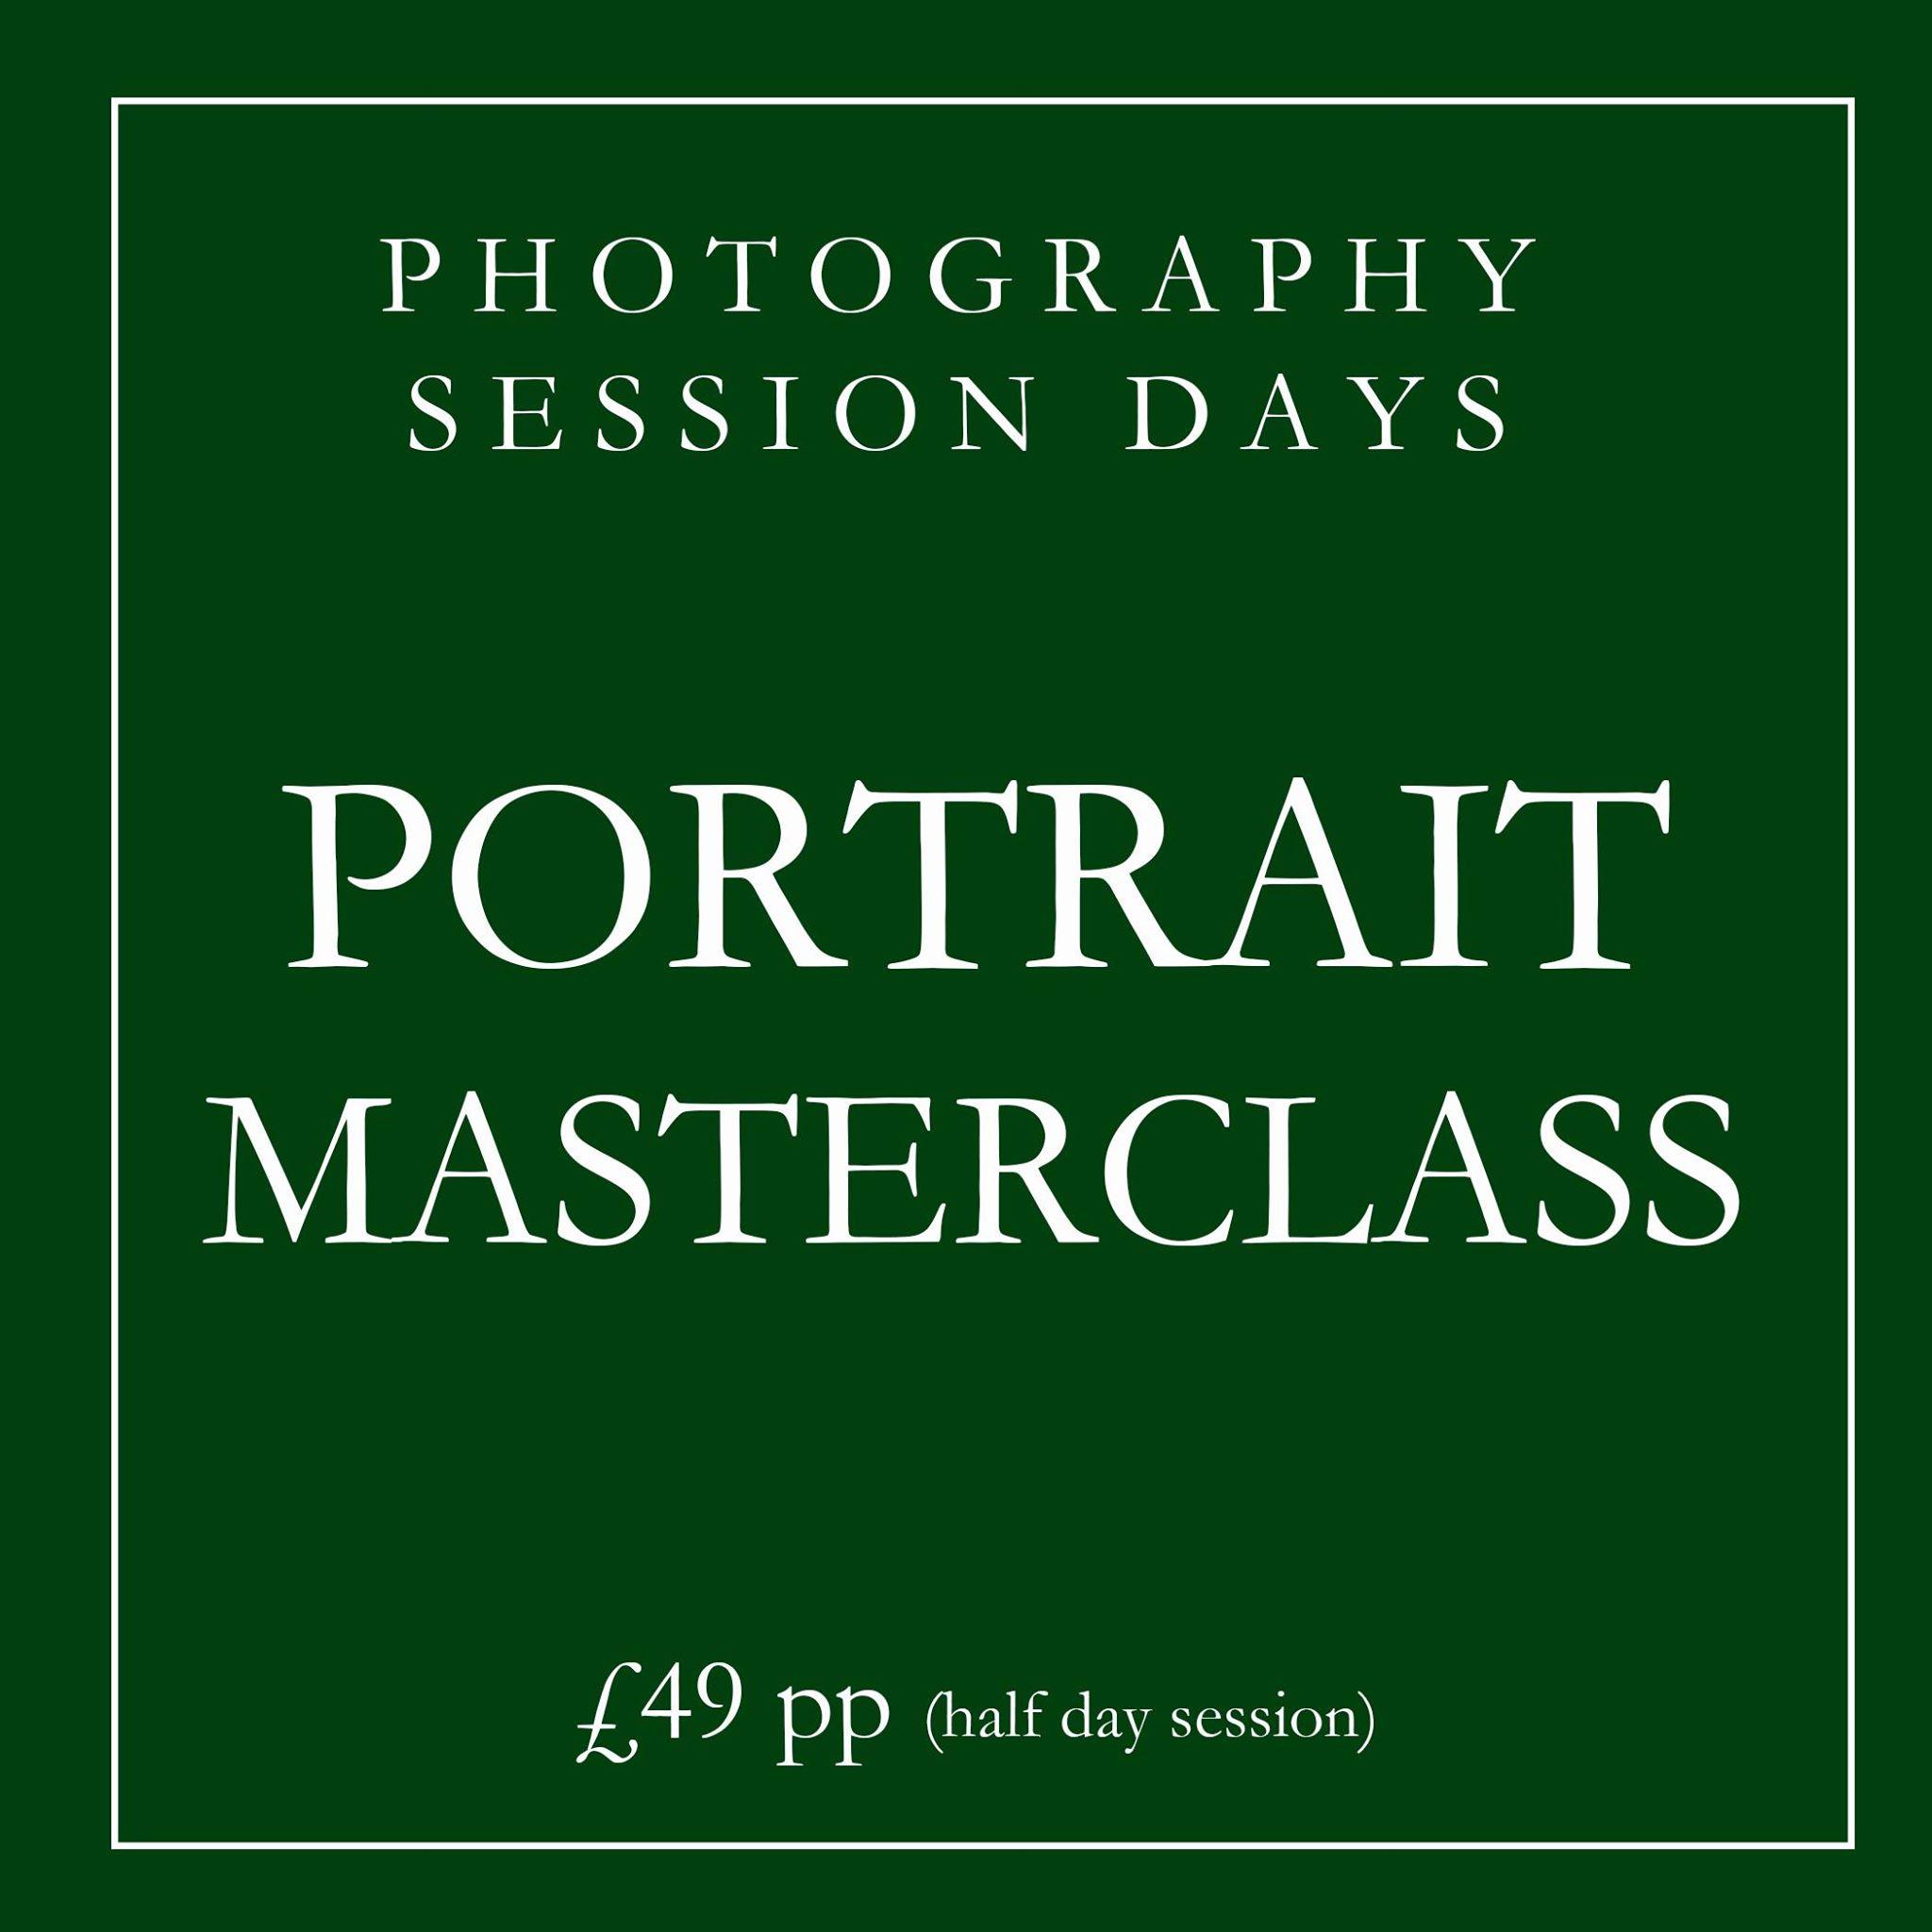 Portrait Masterclass